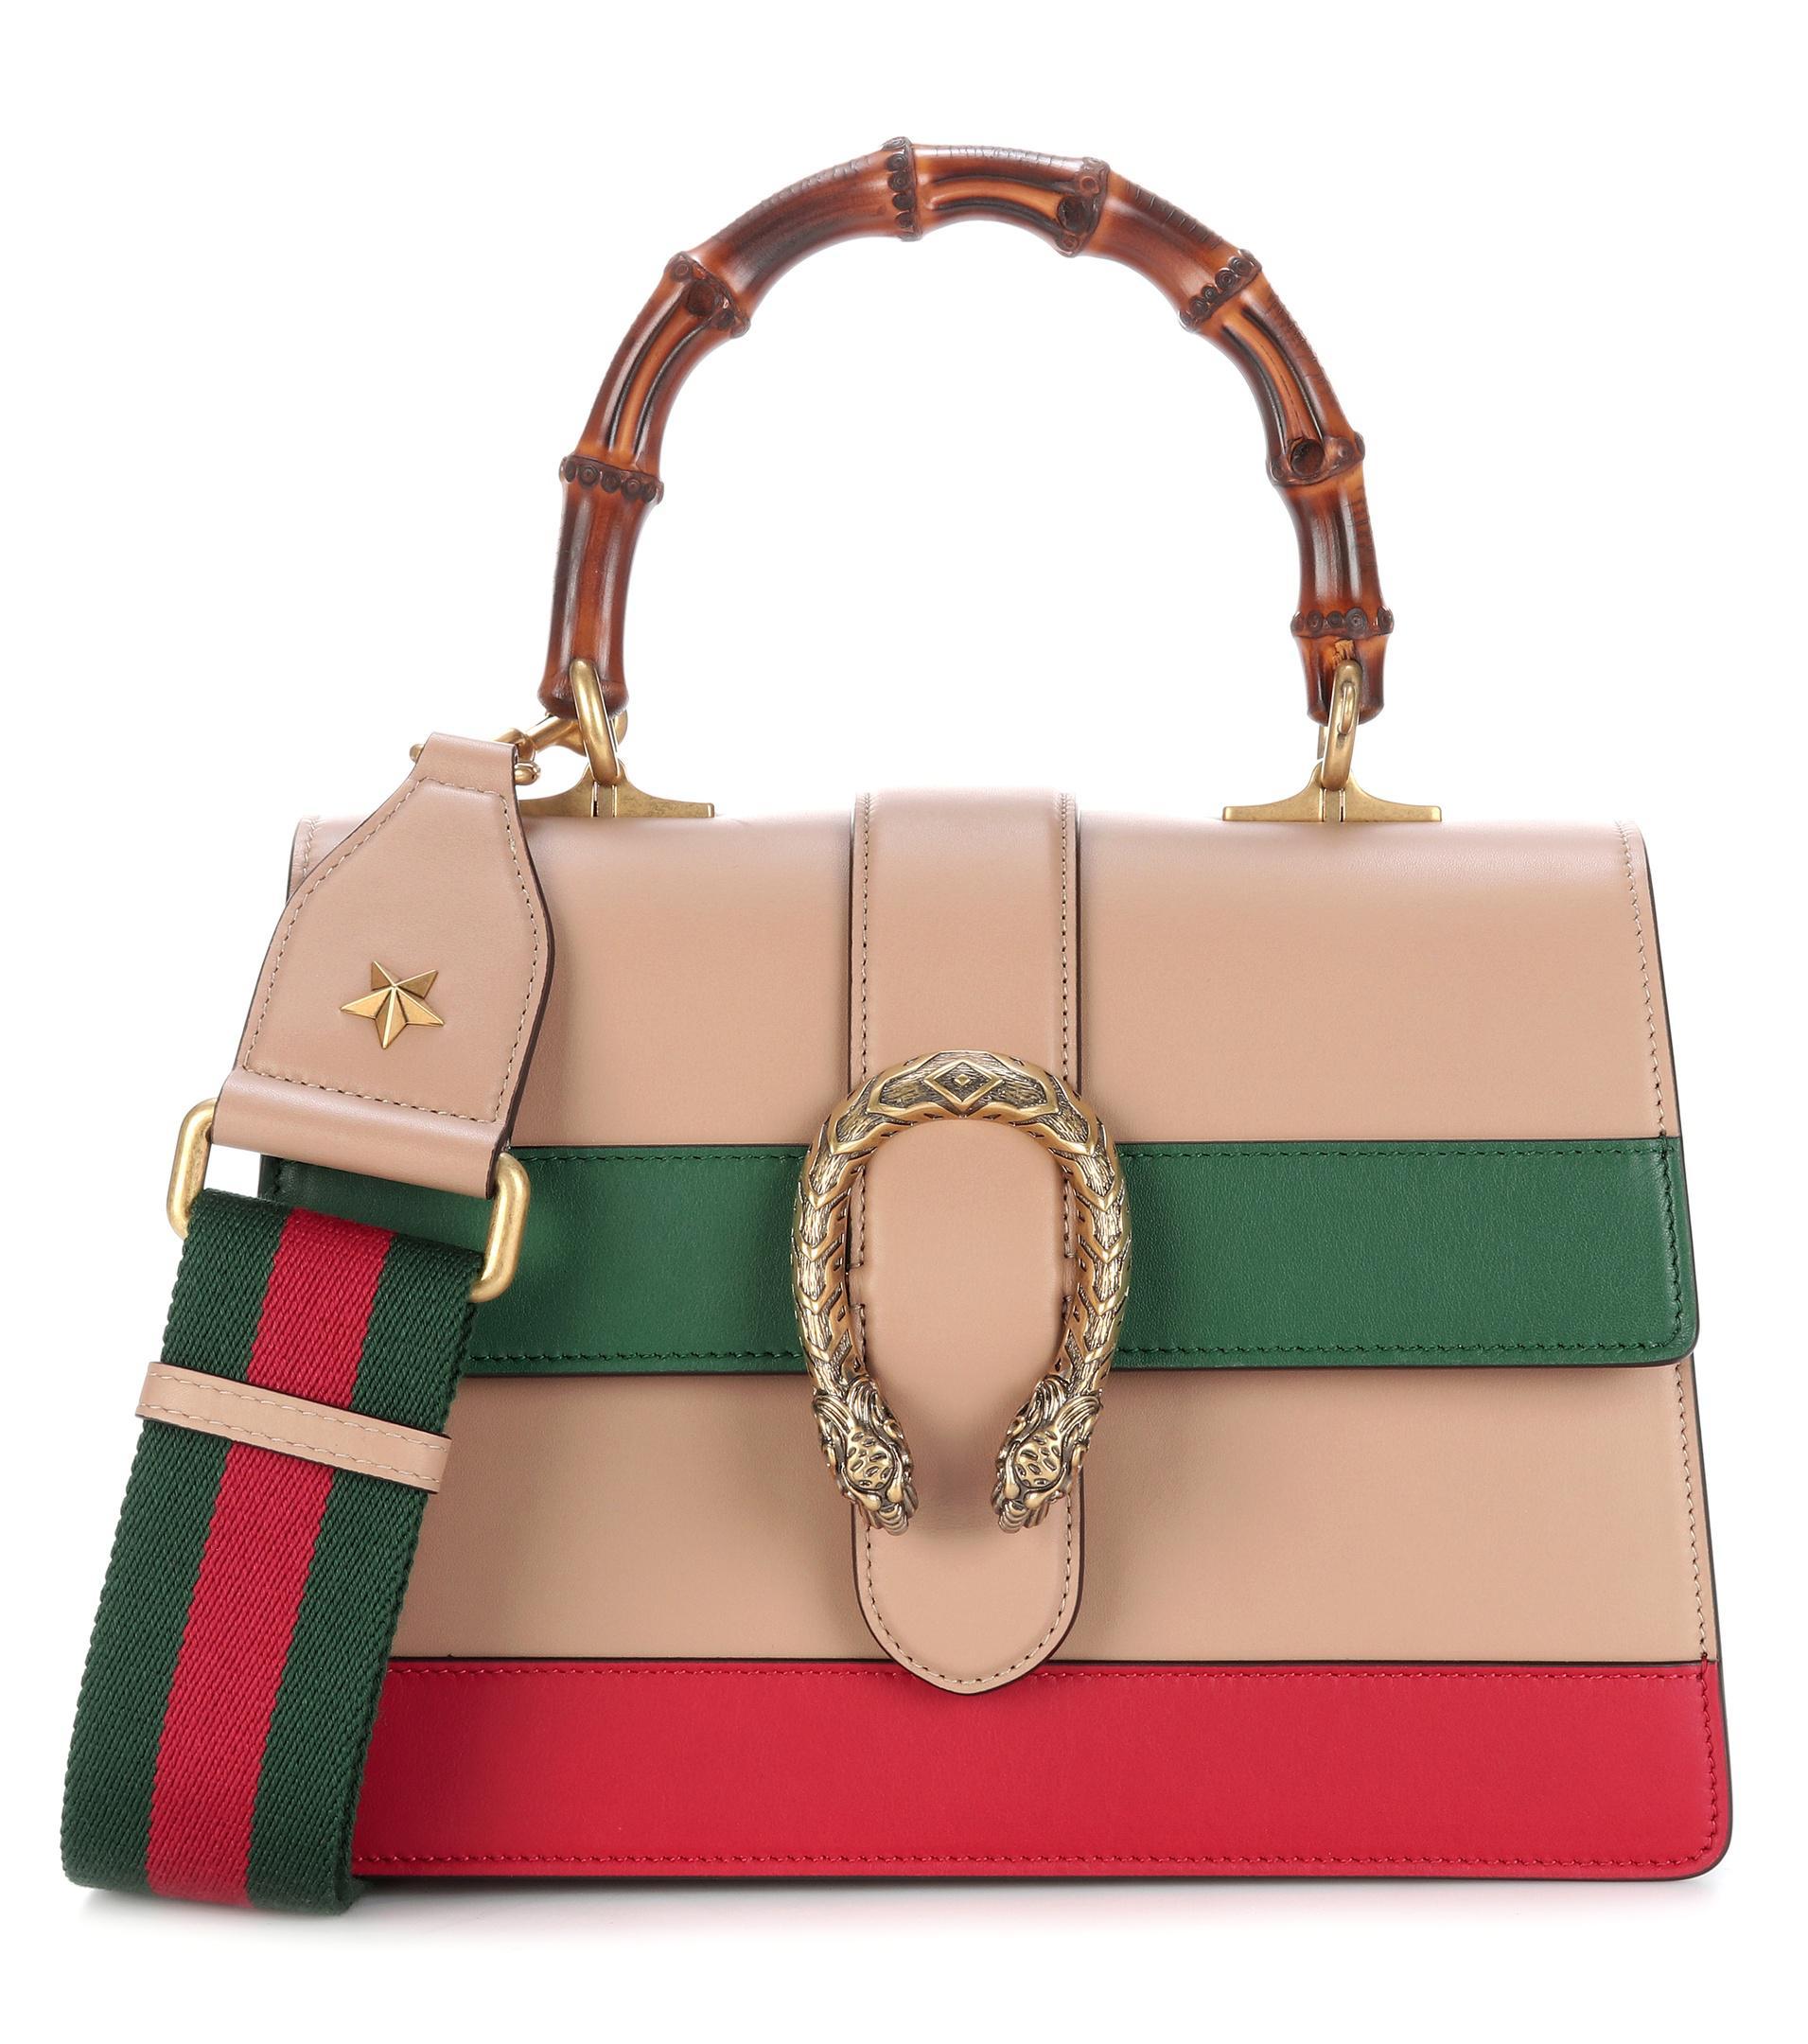 8e241c375ff Gucci Dionysus Bamboo Medium Leather Shoulder Bag in Natural - Lyst